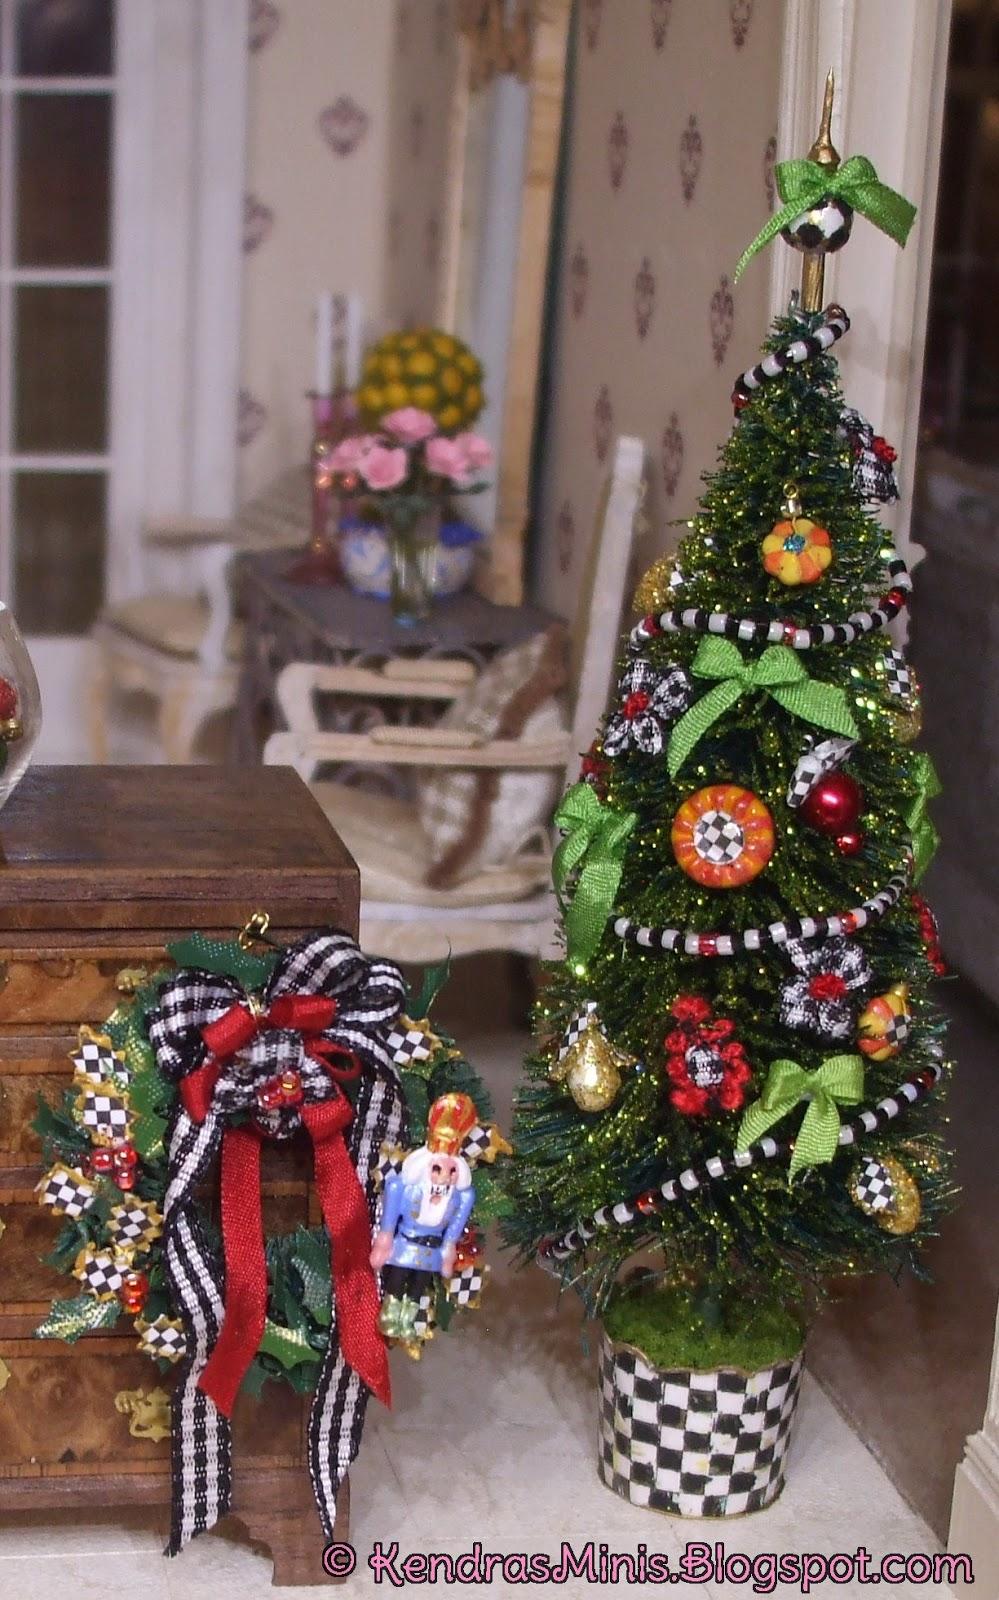 Kendra's Minis: Mackenzie-Childs Inspired Dollhouse Miniatures